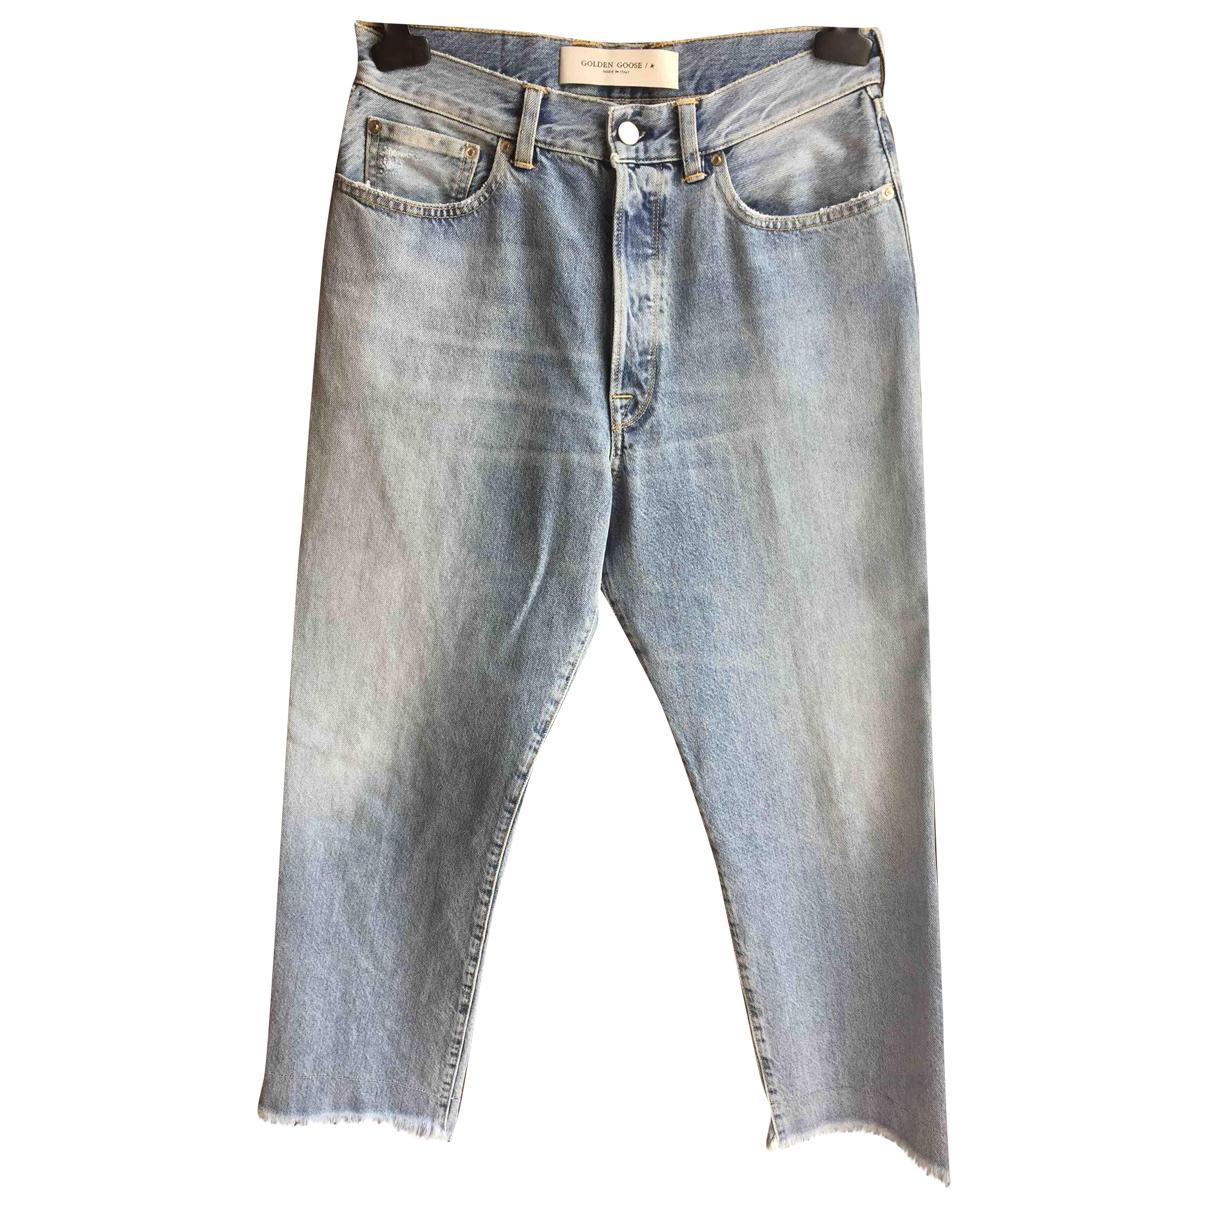 Golden Goose \N Blue Denim - Jeans Jeans for Women 30 US